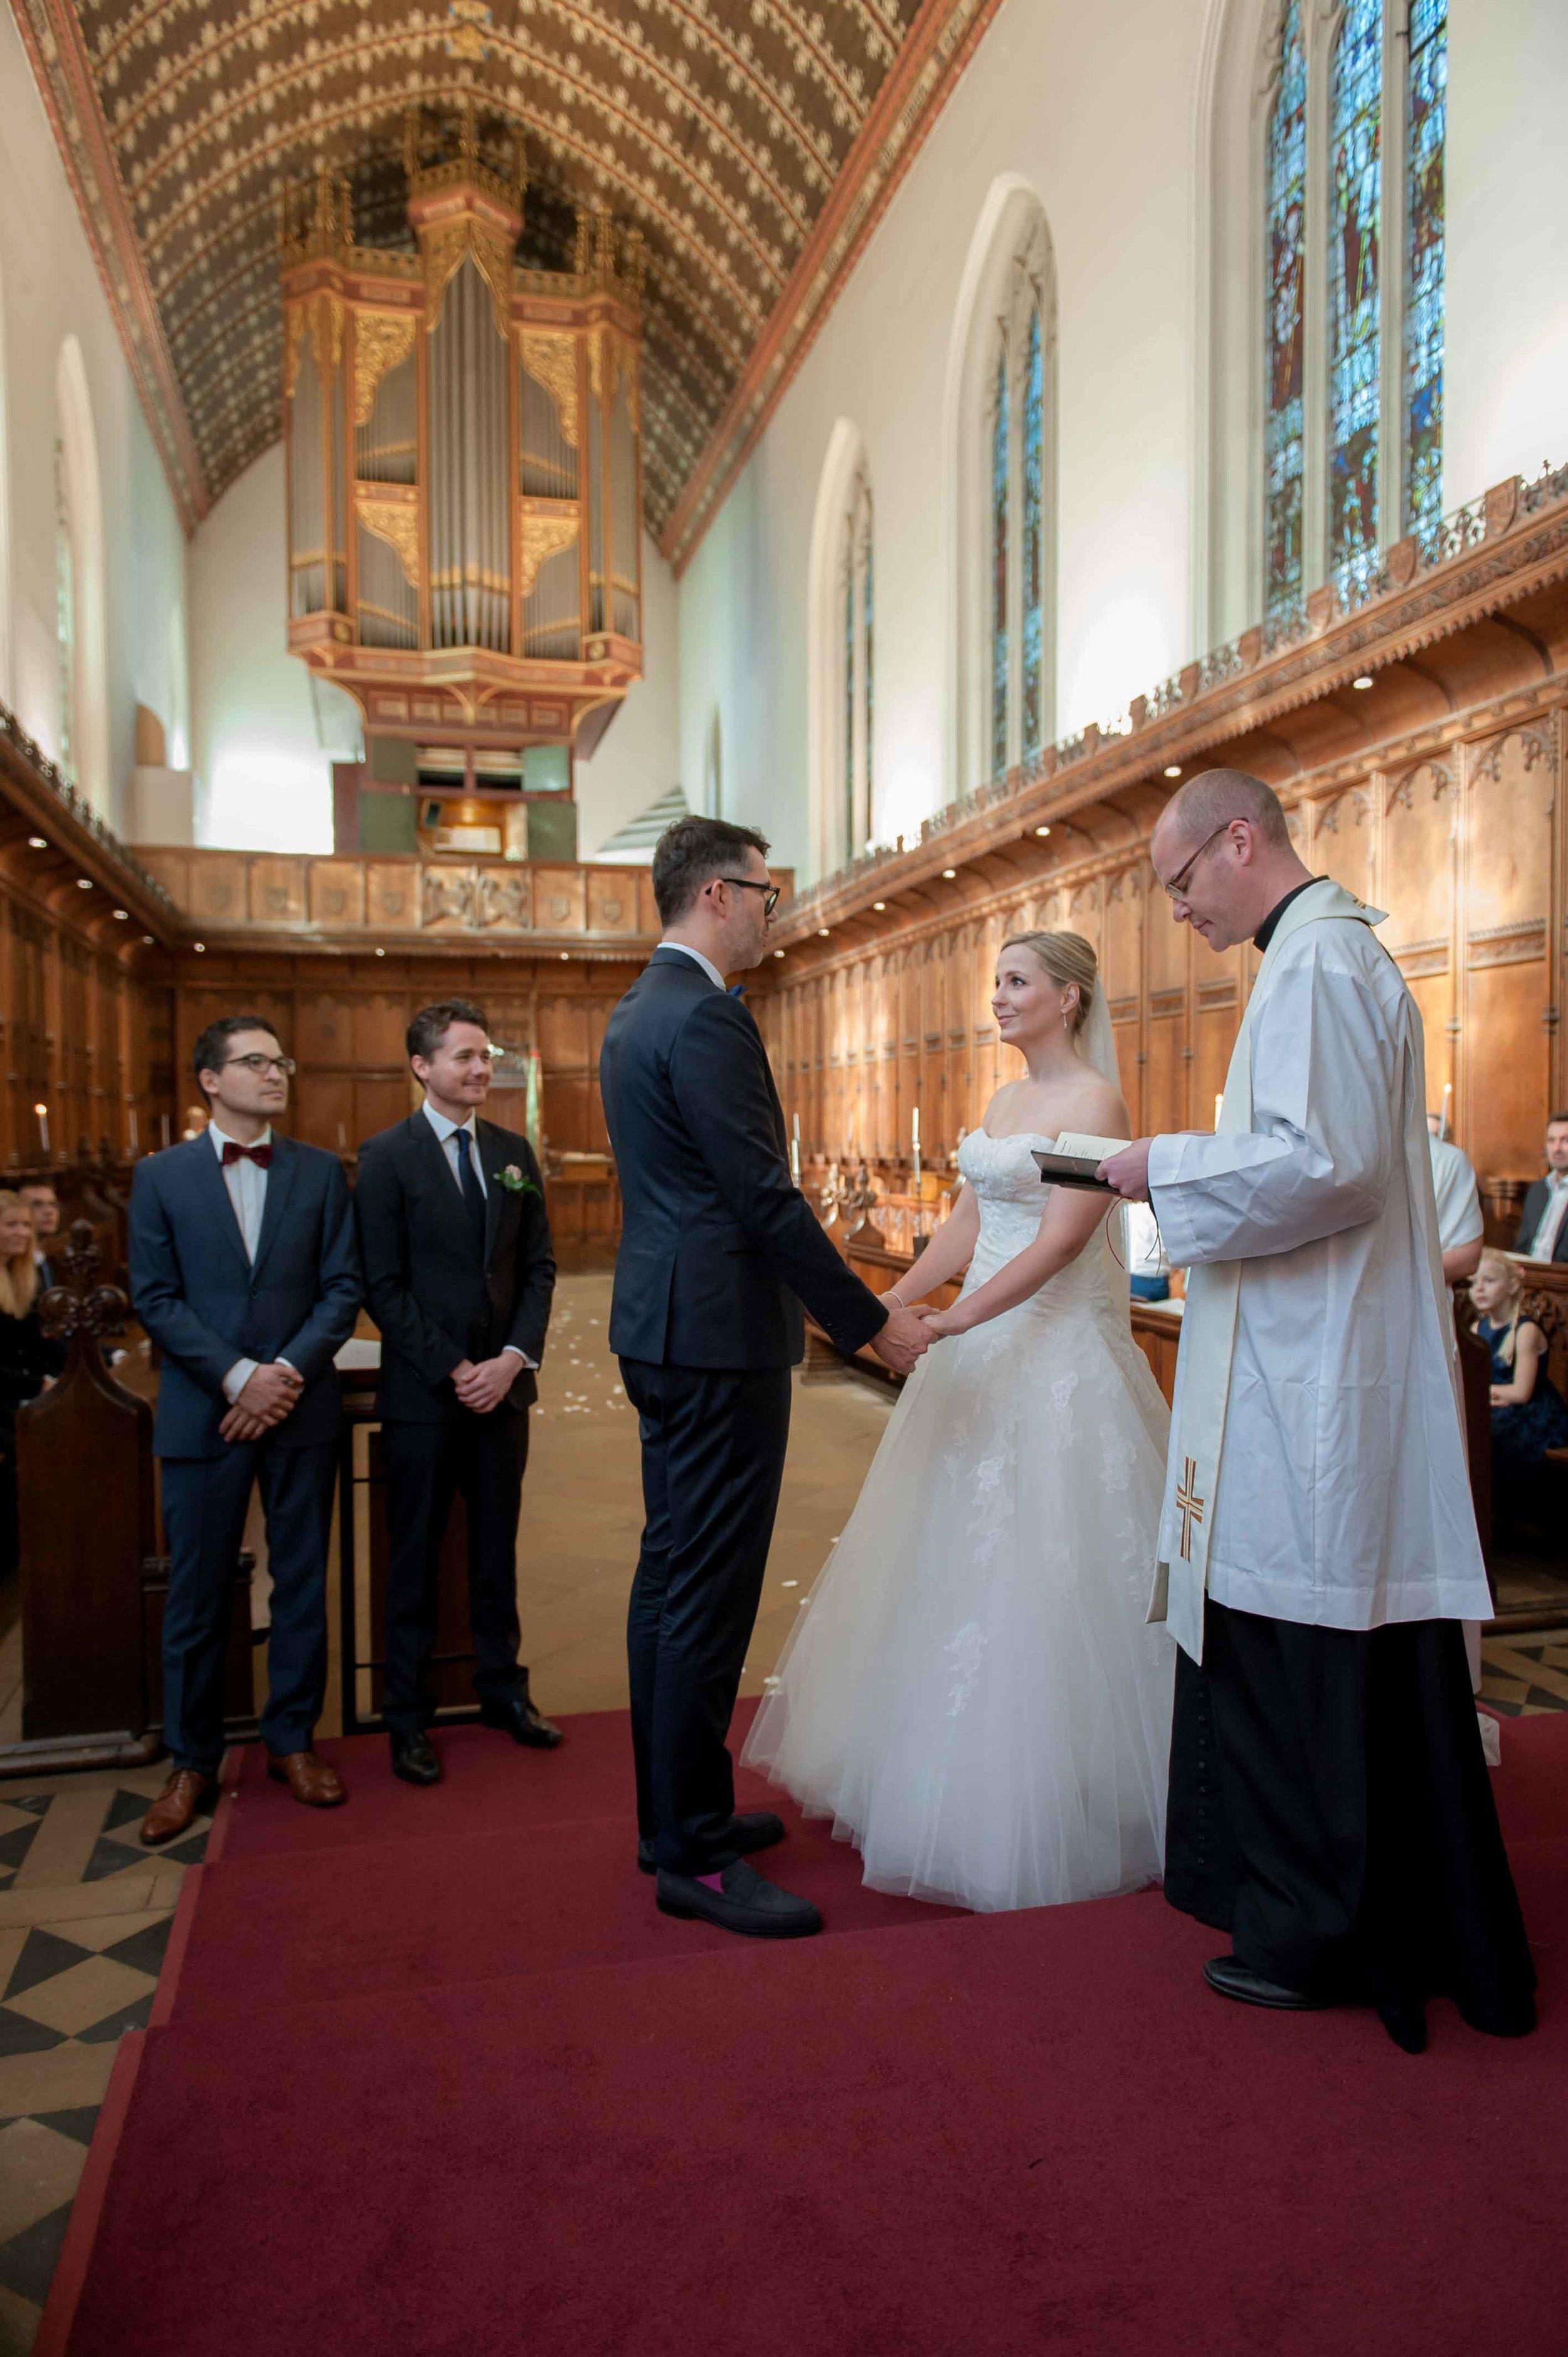 Adrian_Nicole_Charnwood_Weddings_Queens_College_Cambridge-1020.jpg